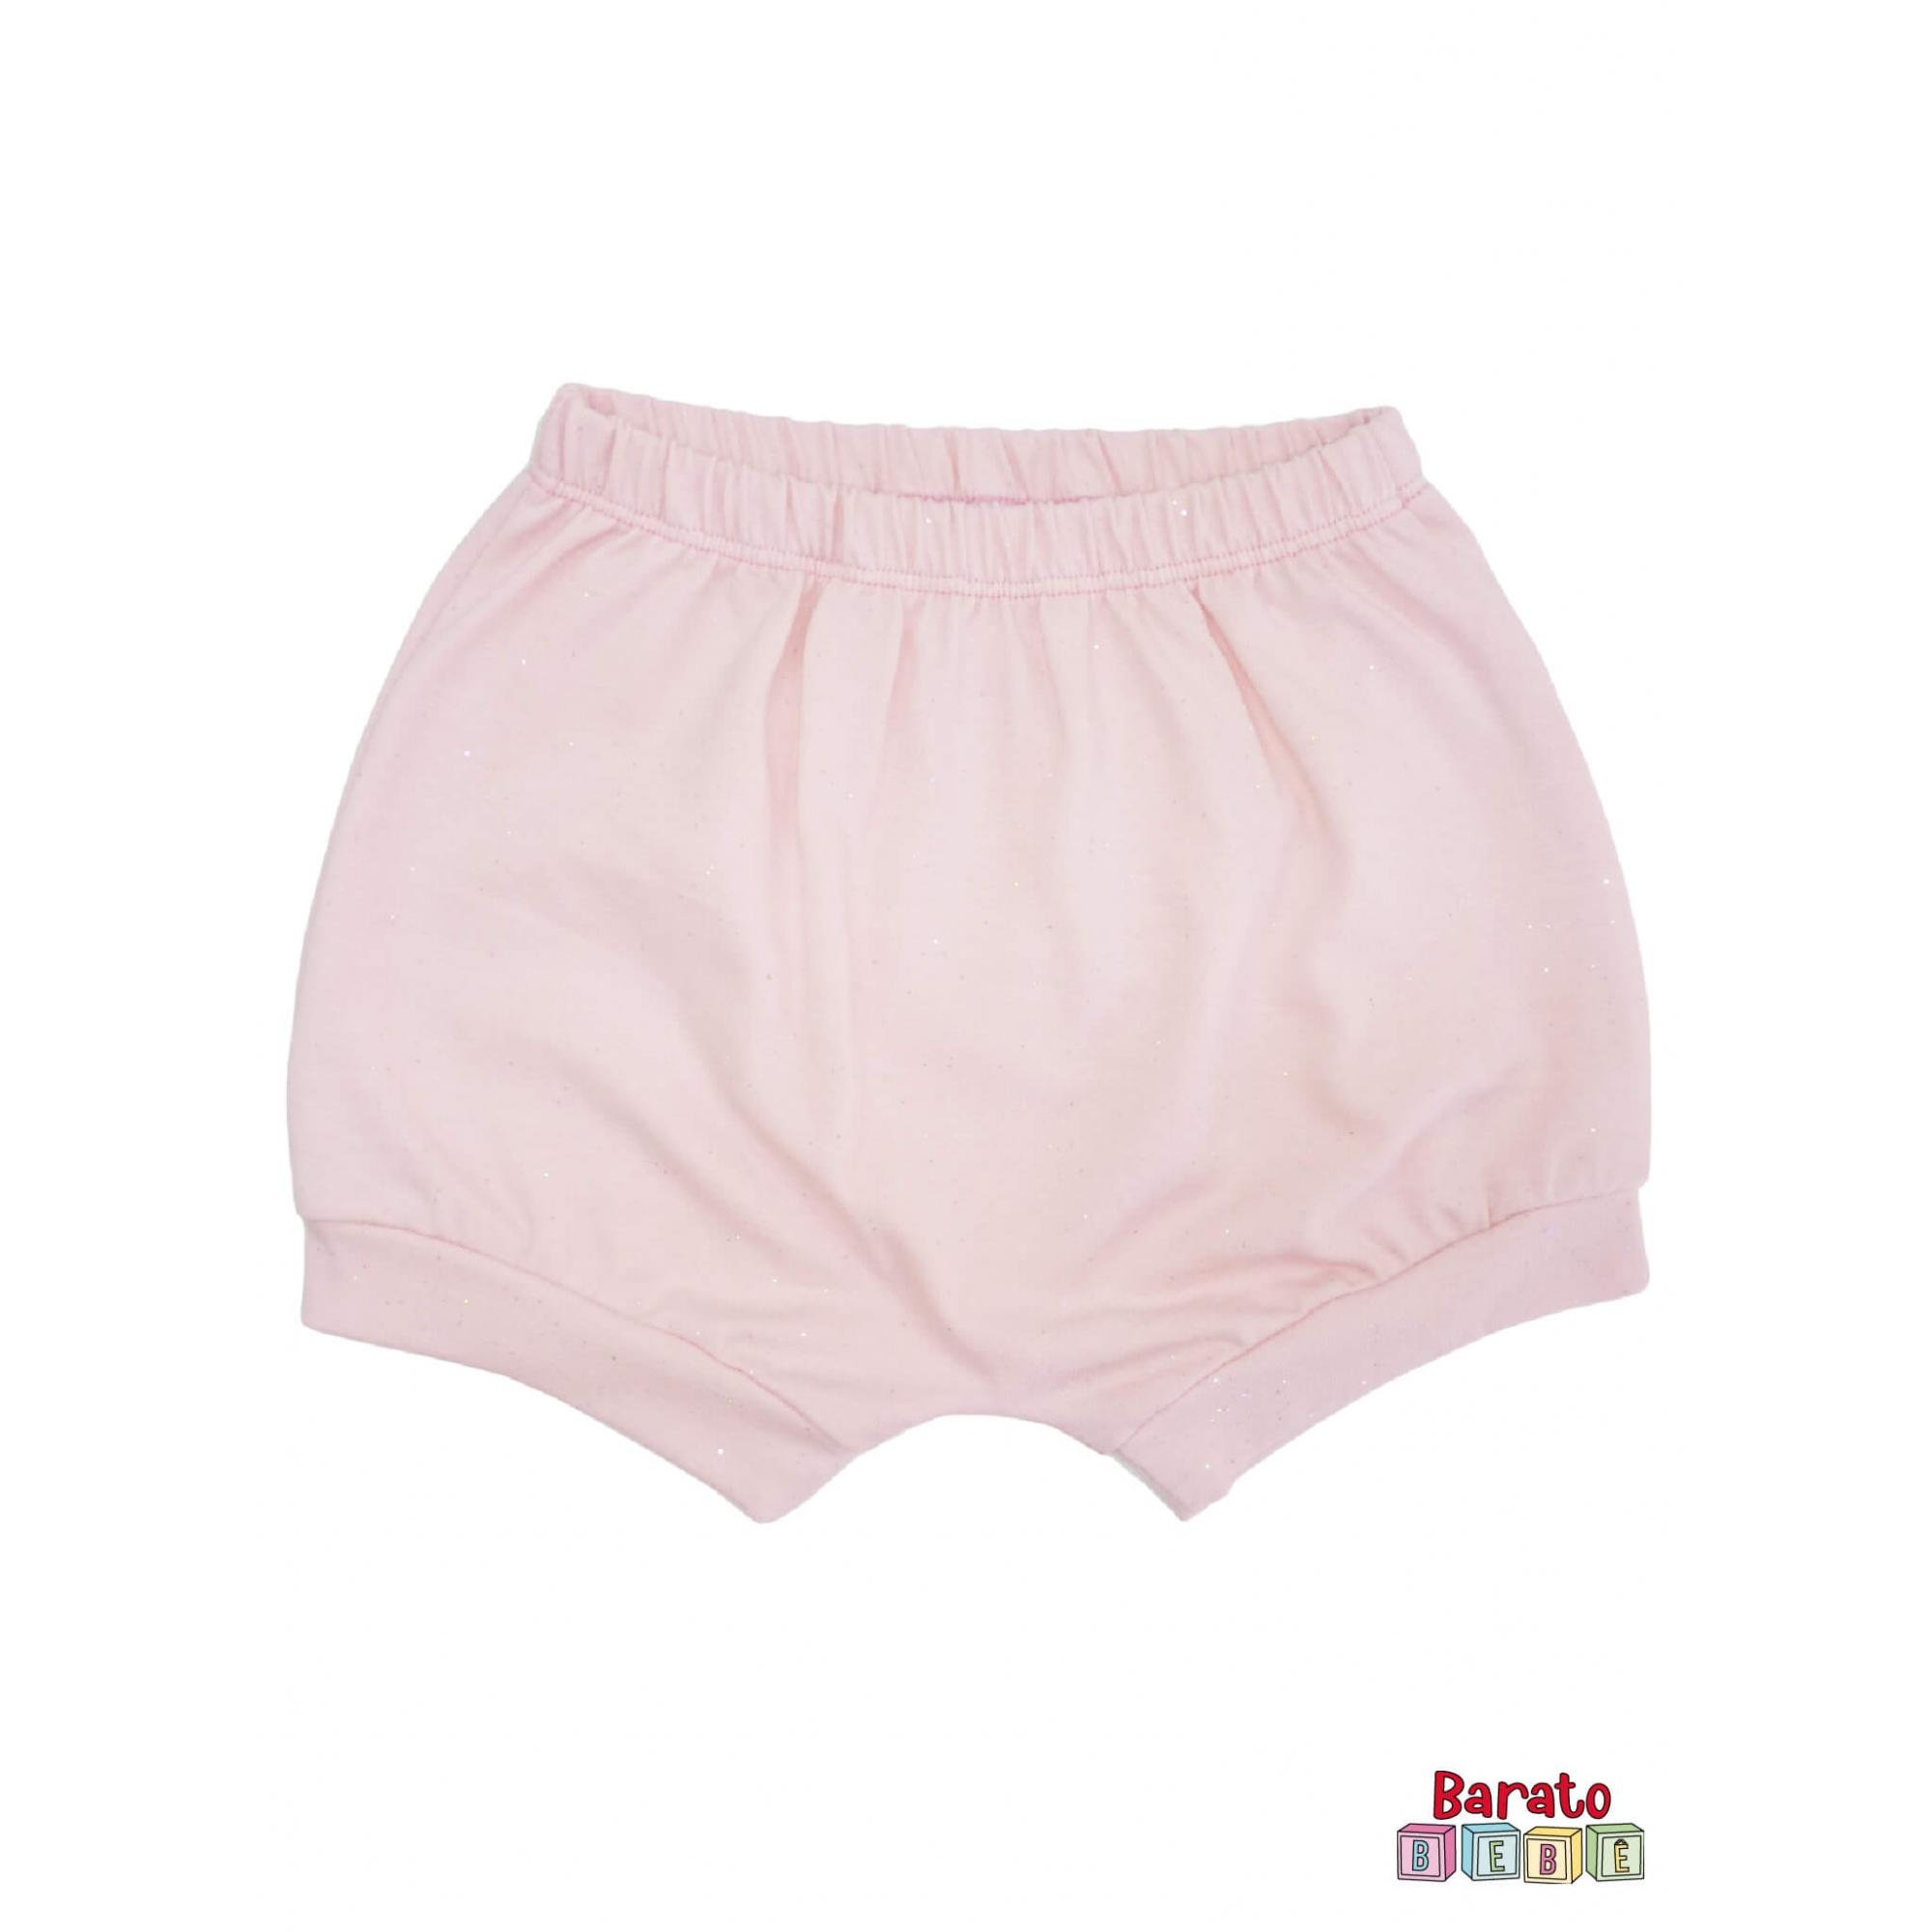 Shorts(Tapa Fralda) Bebê(P/M/G)  - Barato Bebê - Rosa c/ Glitter